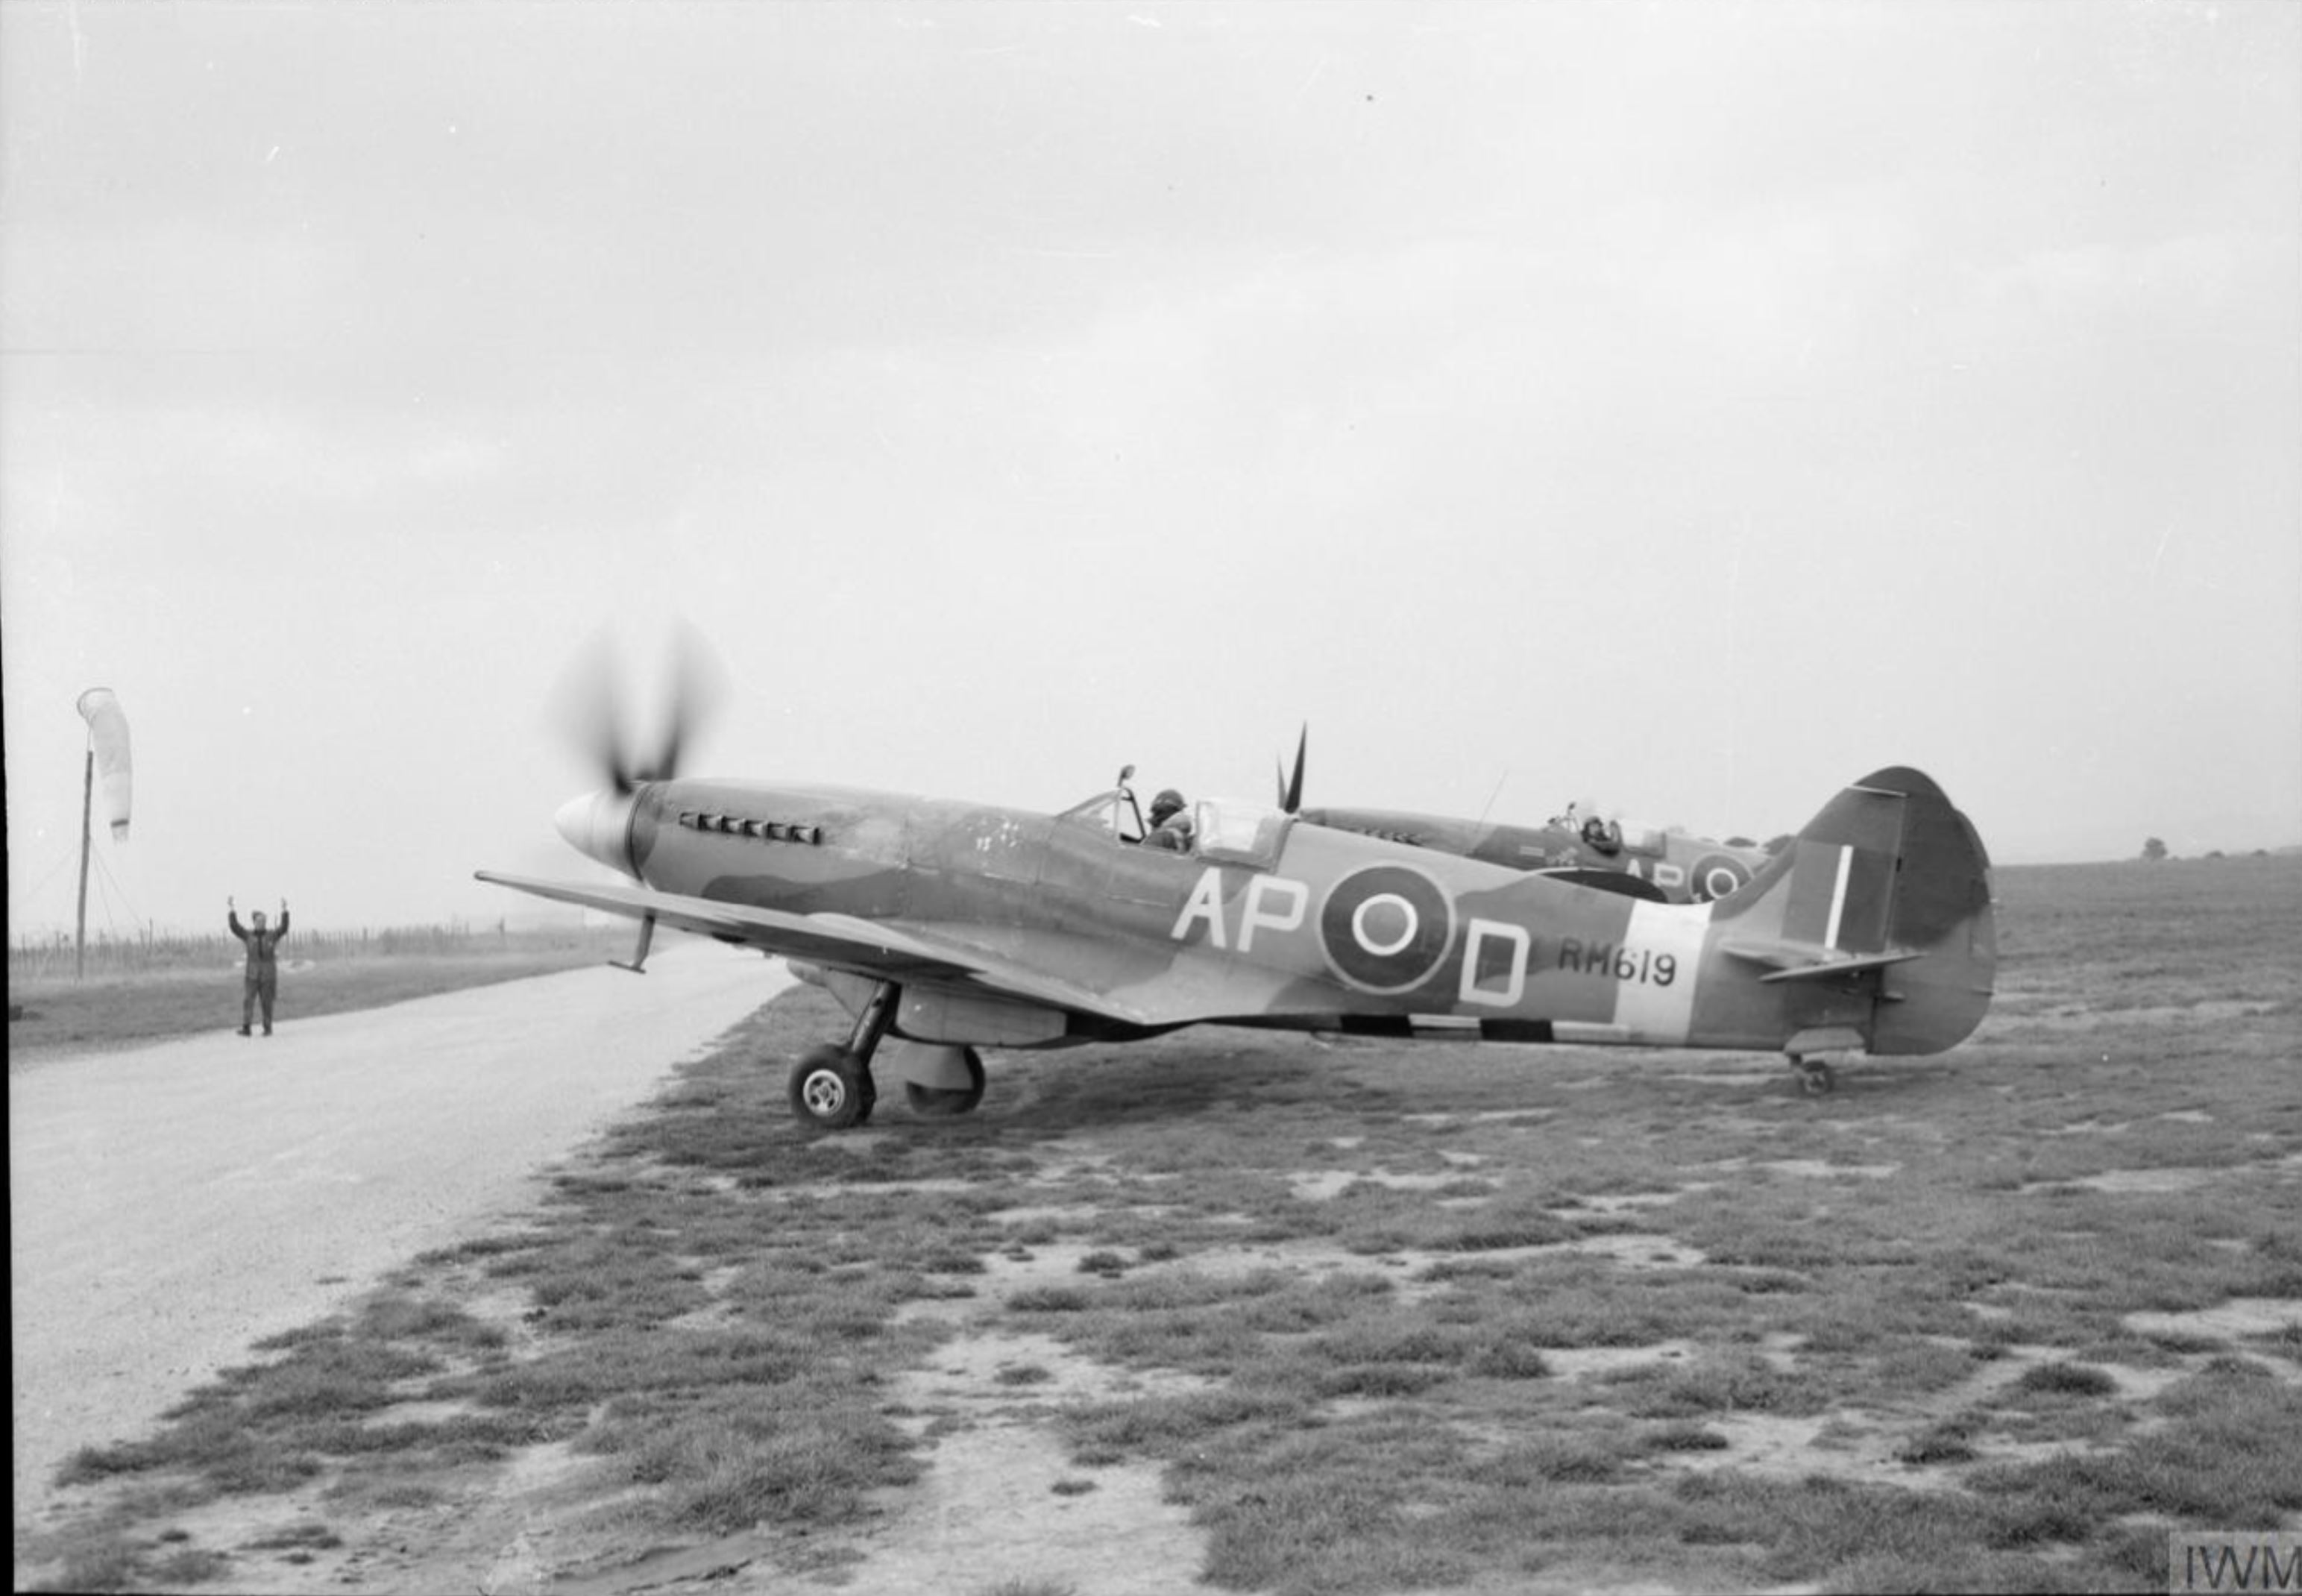 Spitfire F14 RAF 350Sqn APD RM619 ex 130qn at Lympne Kent IWM CL1353